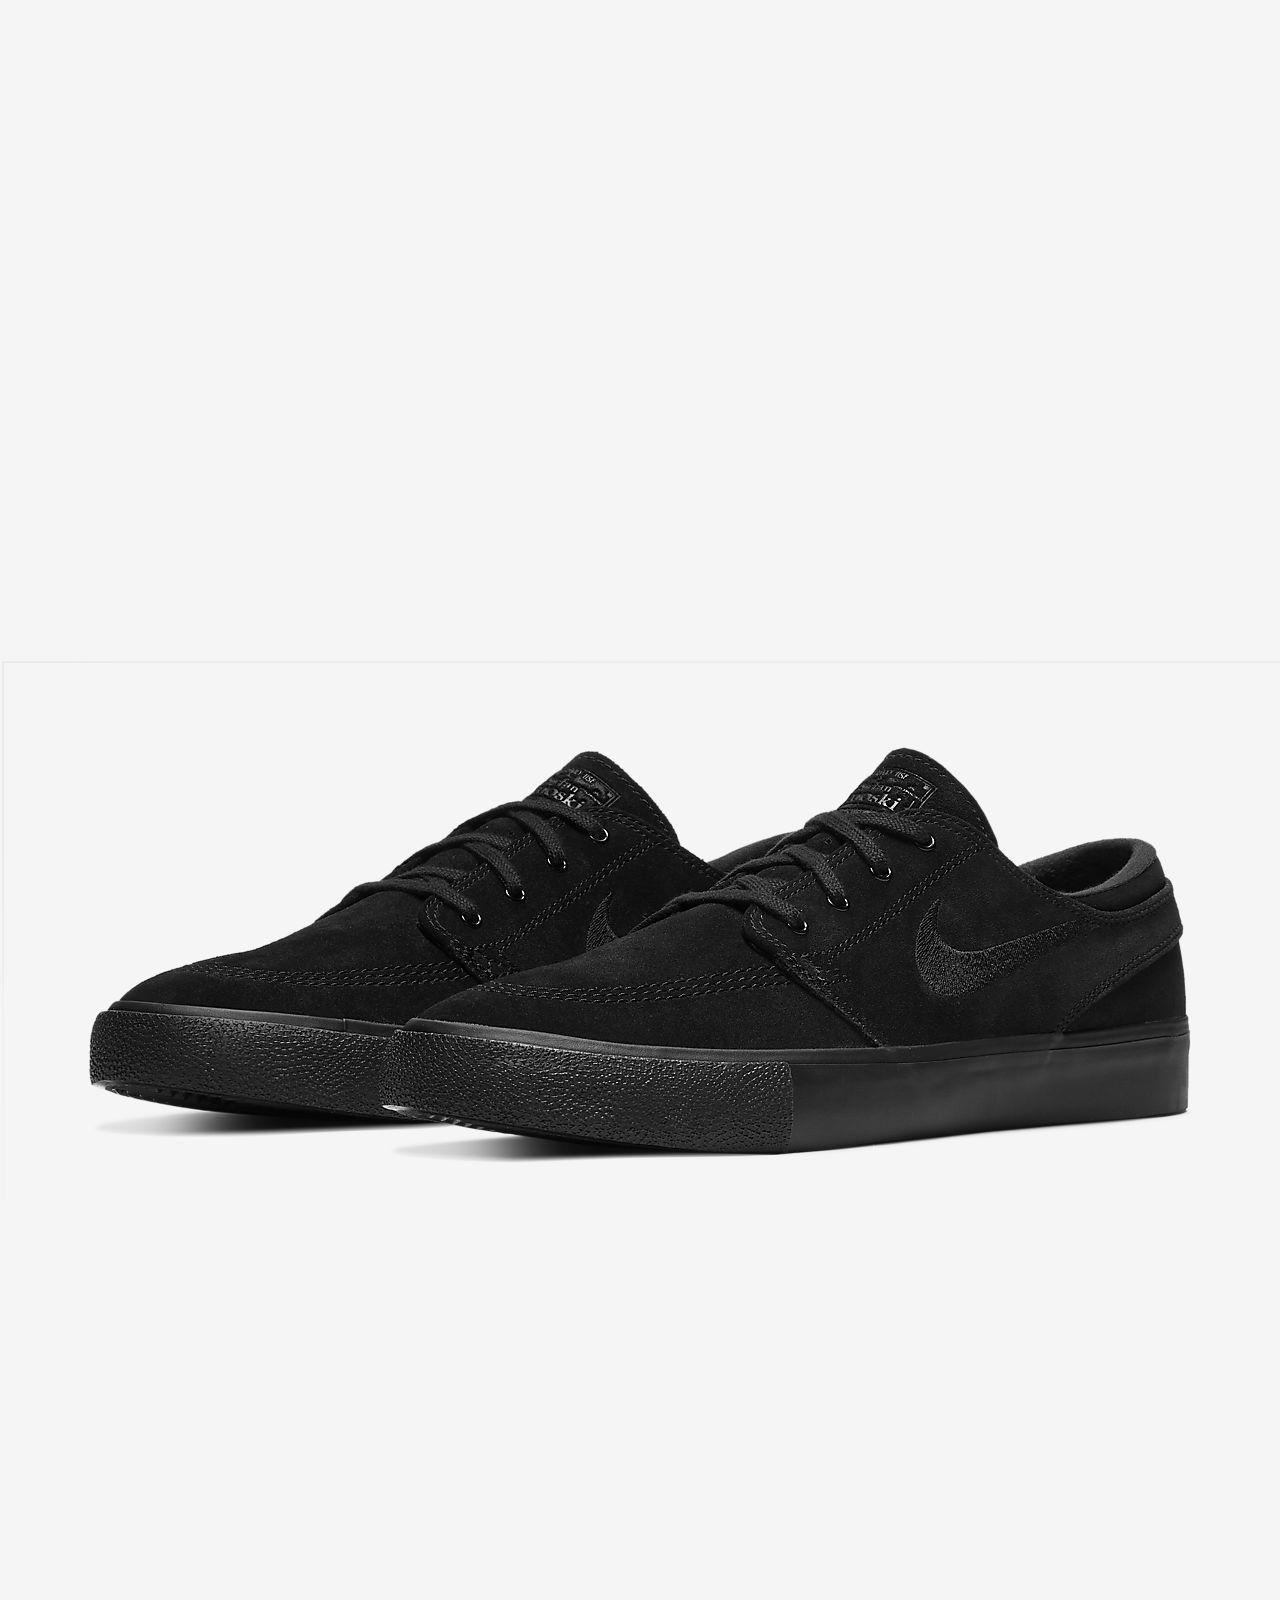 biggest discount buying cheap on feet images of Nike SB Zoom Stefan Janoski RM Skate Shoe. Nike GB